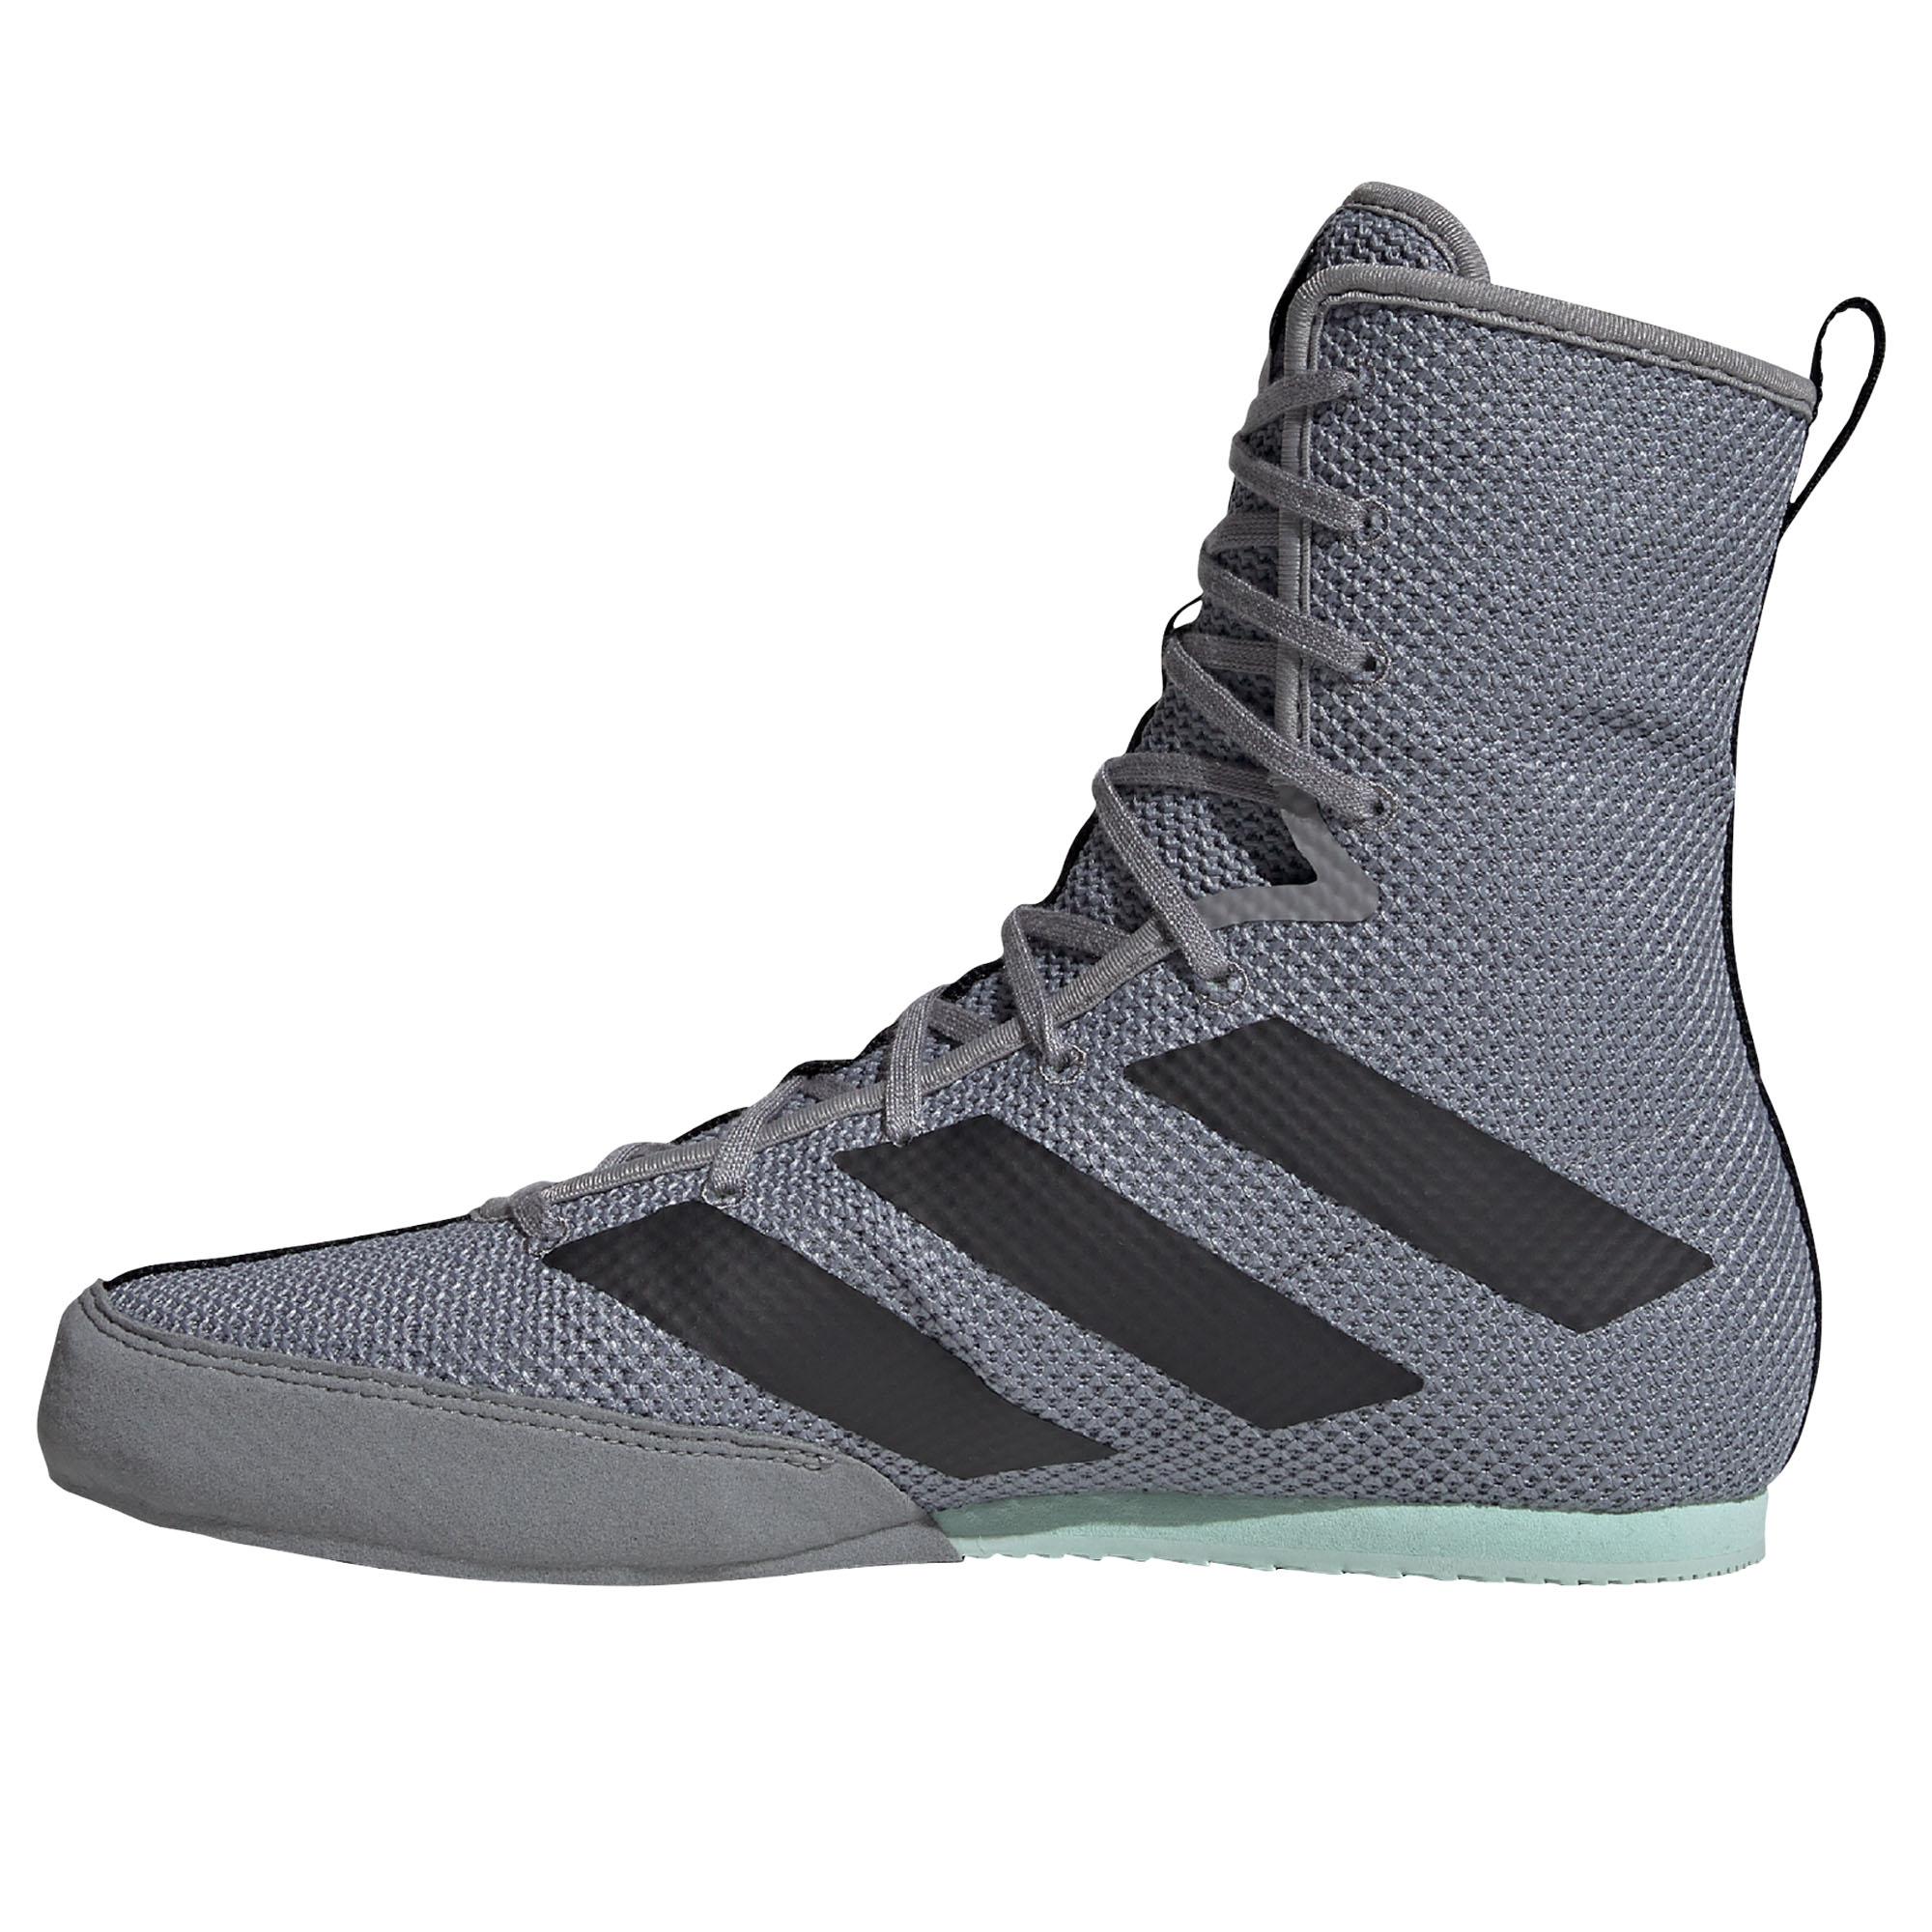 miniature 8 - Adidas Box Hog 3 boxe Trainer Shoe Boot gris/vert